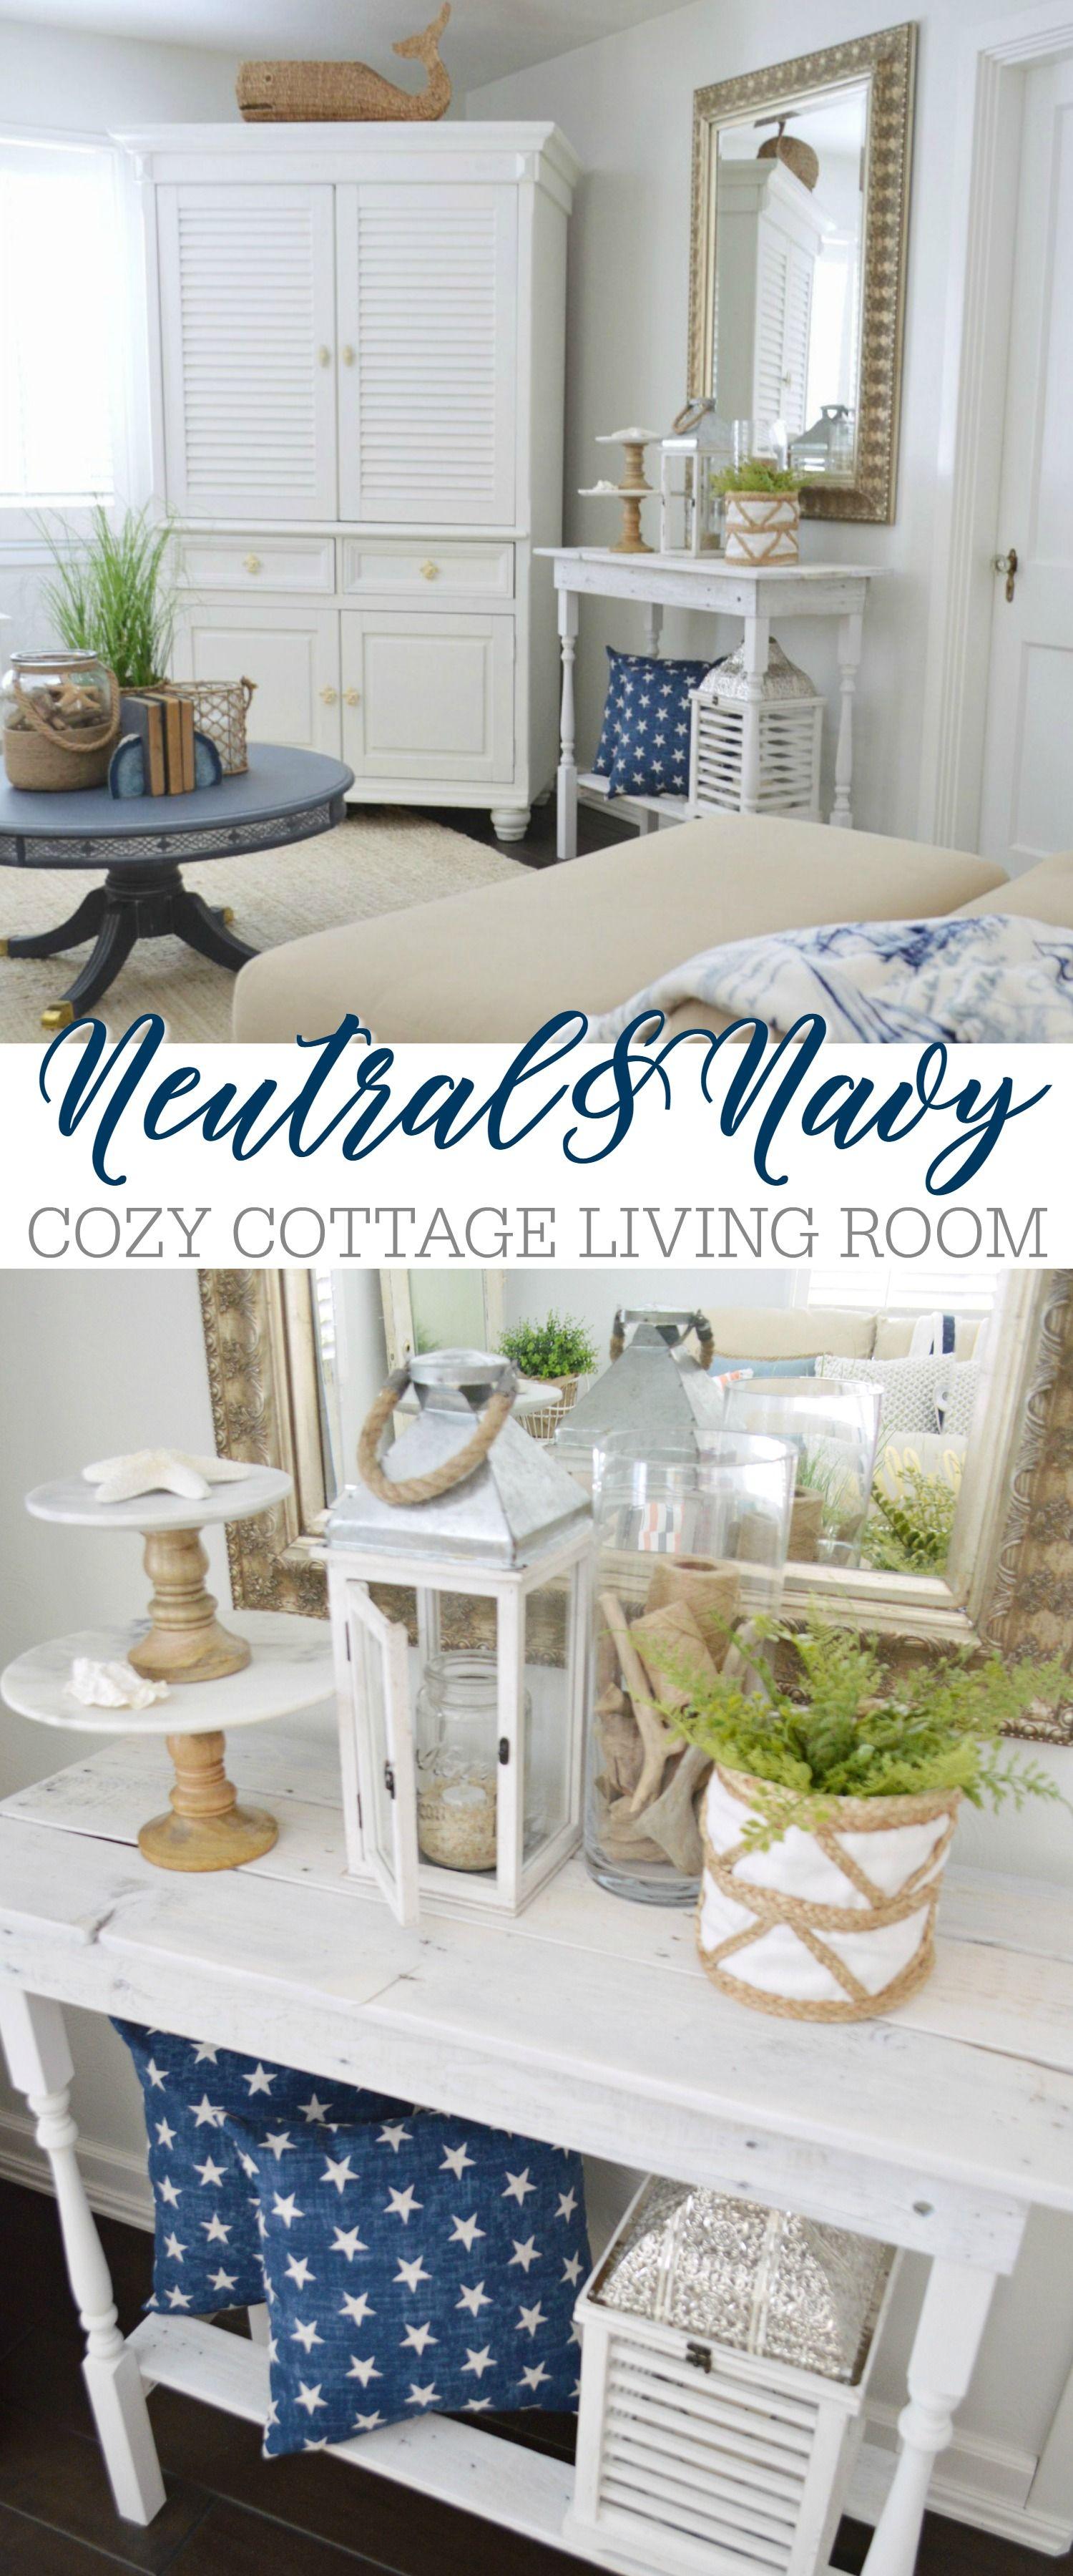 Neutral Navy Living Room Refresh | Cottage living rooms, Furniture ...